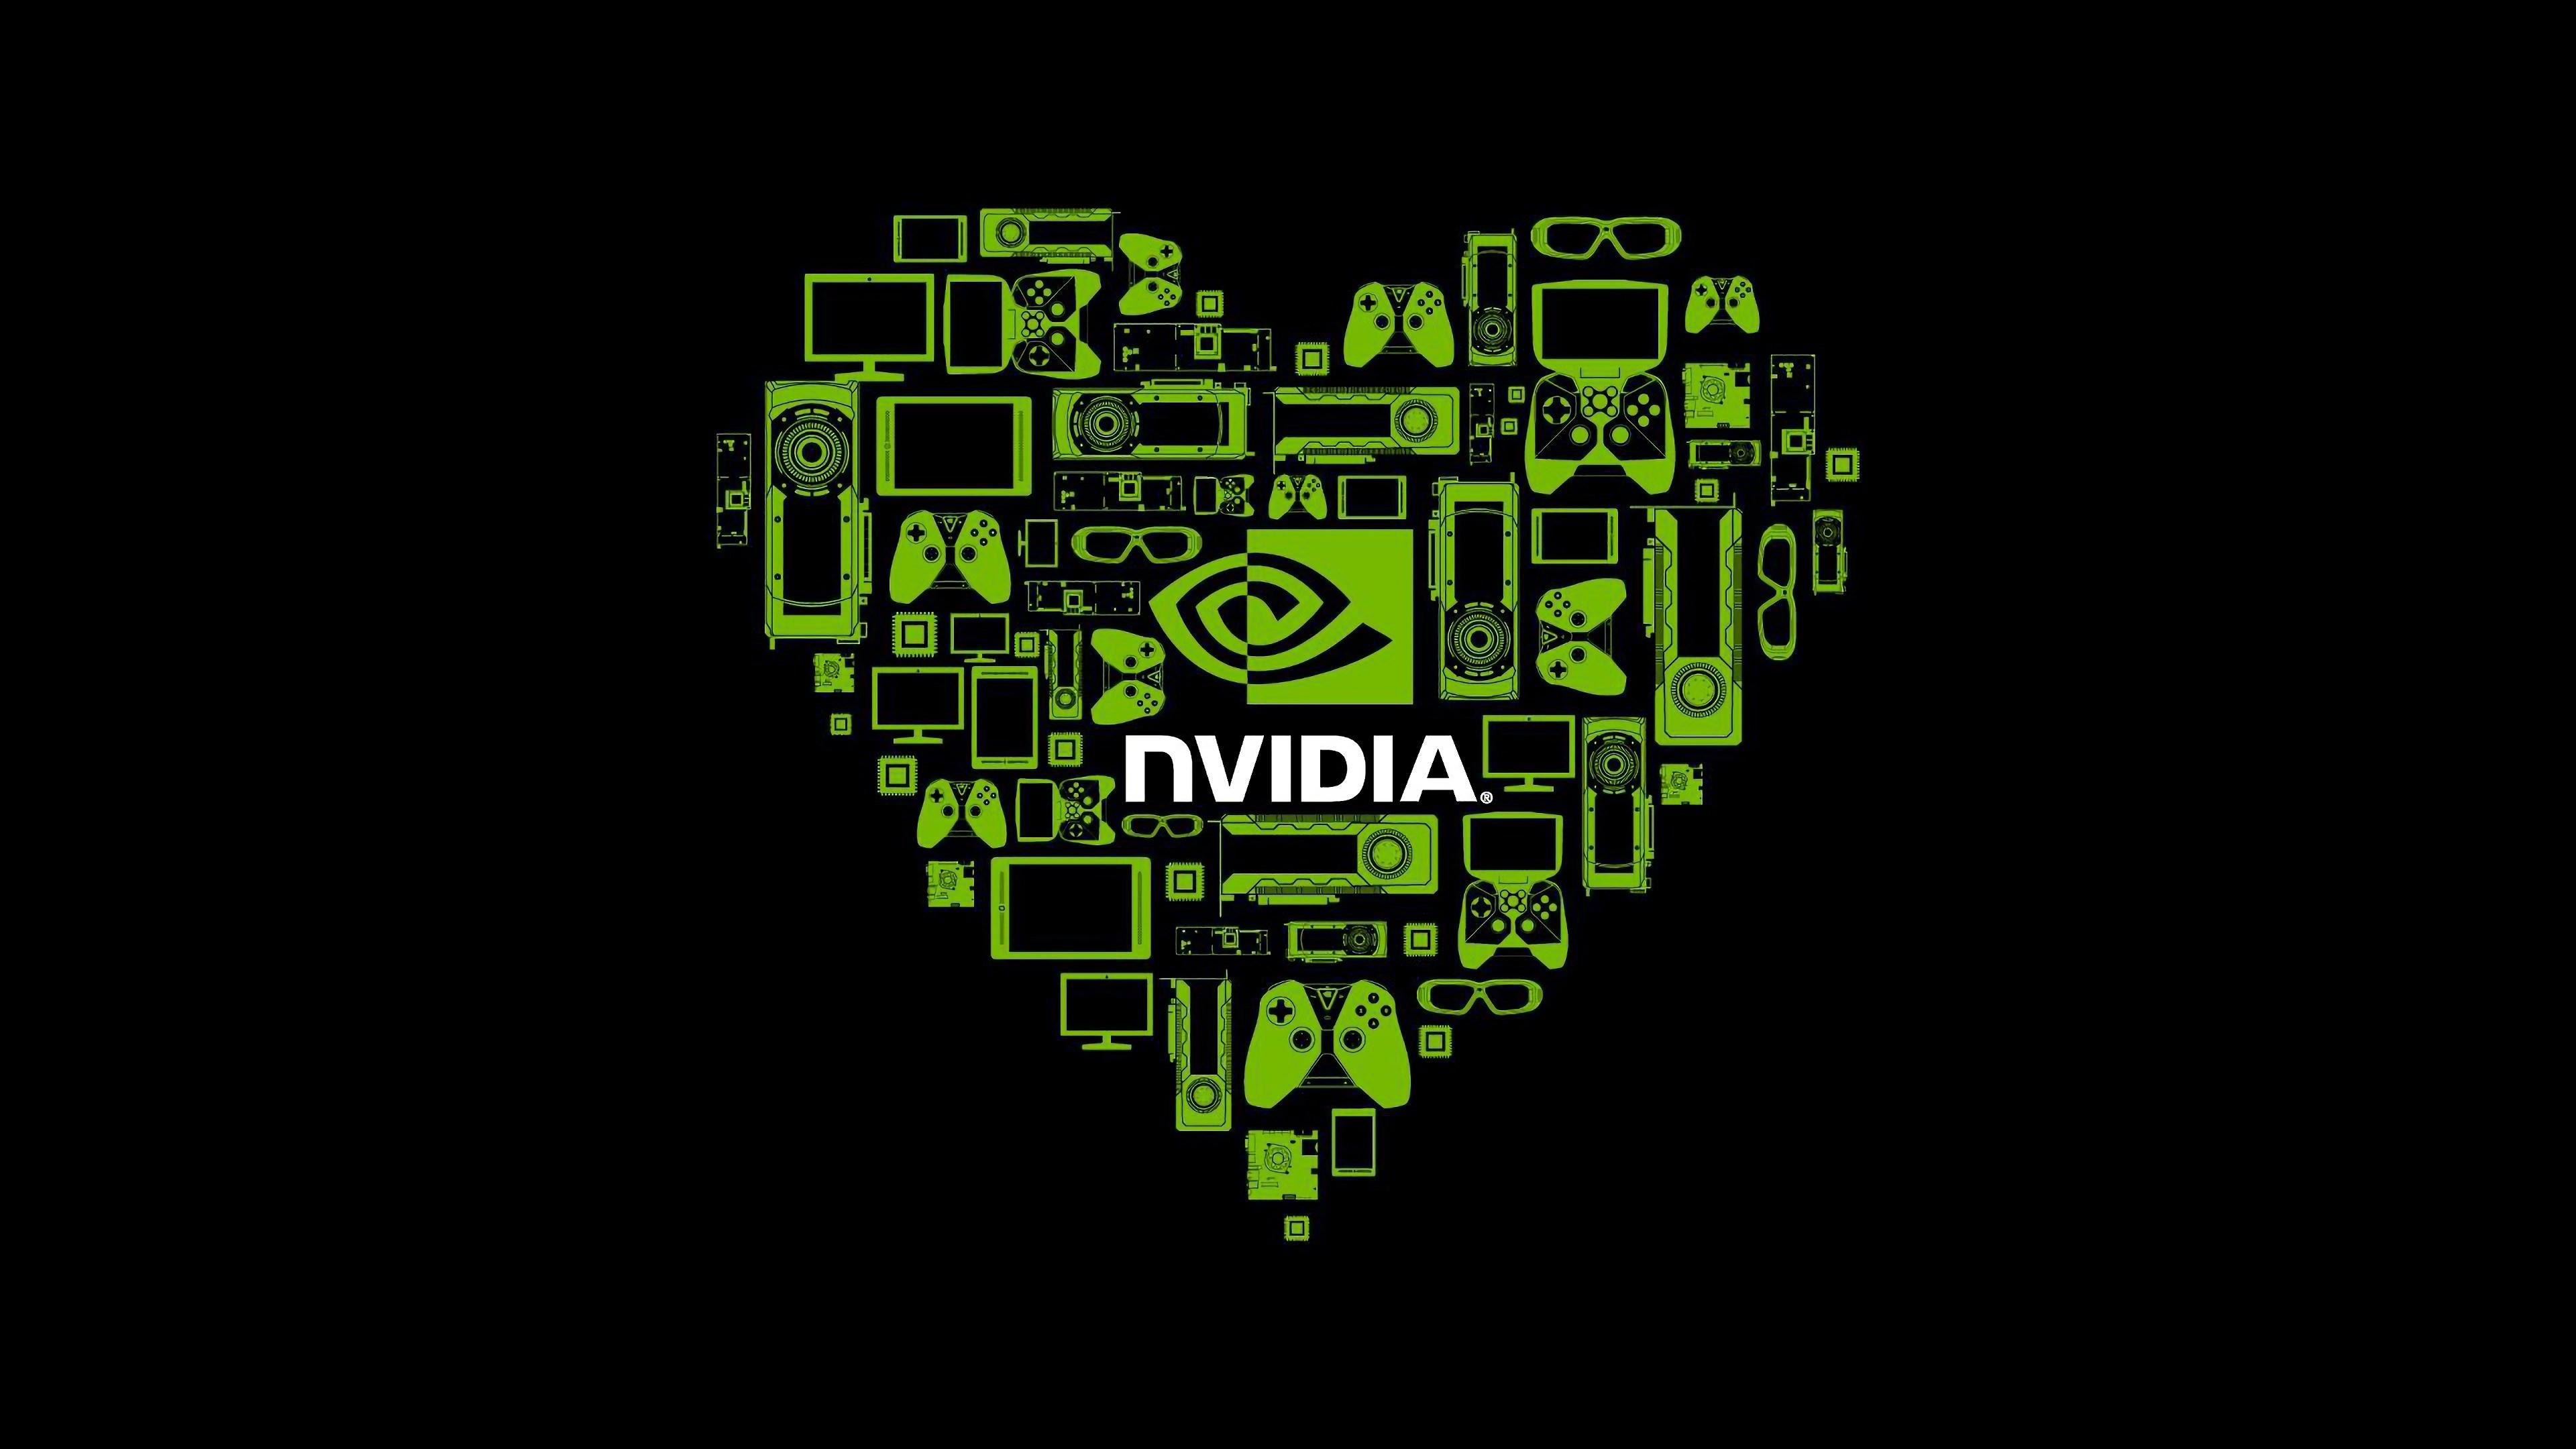 3840x2160 4K Ultra HD Nvidia Wallpapers Desktop Backgrounds